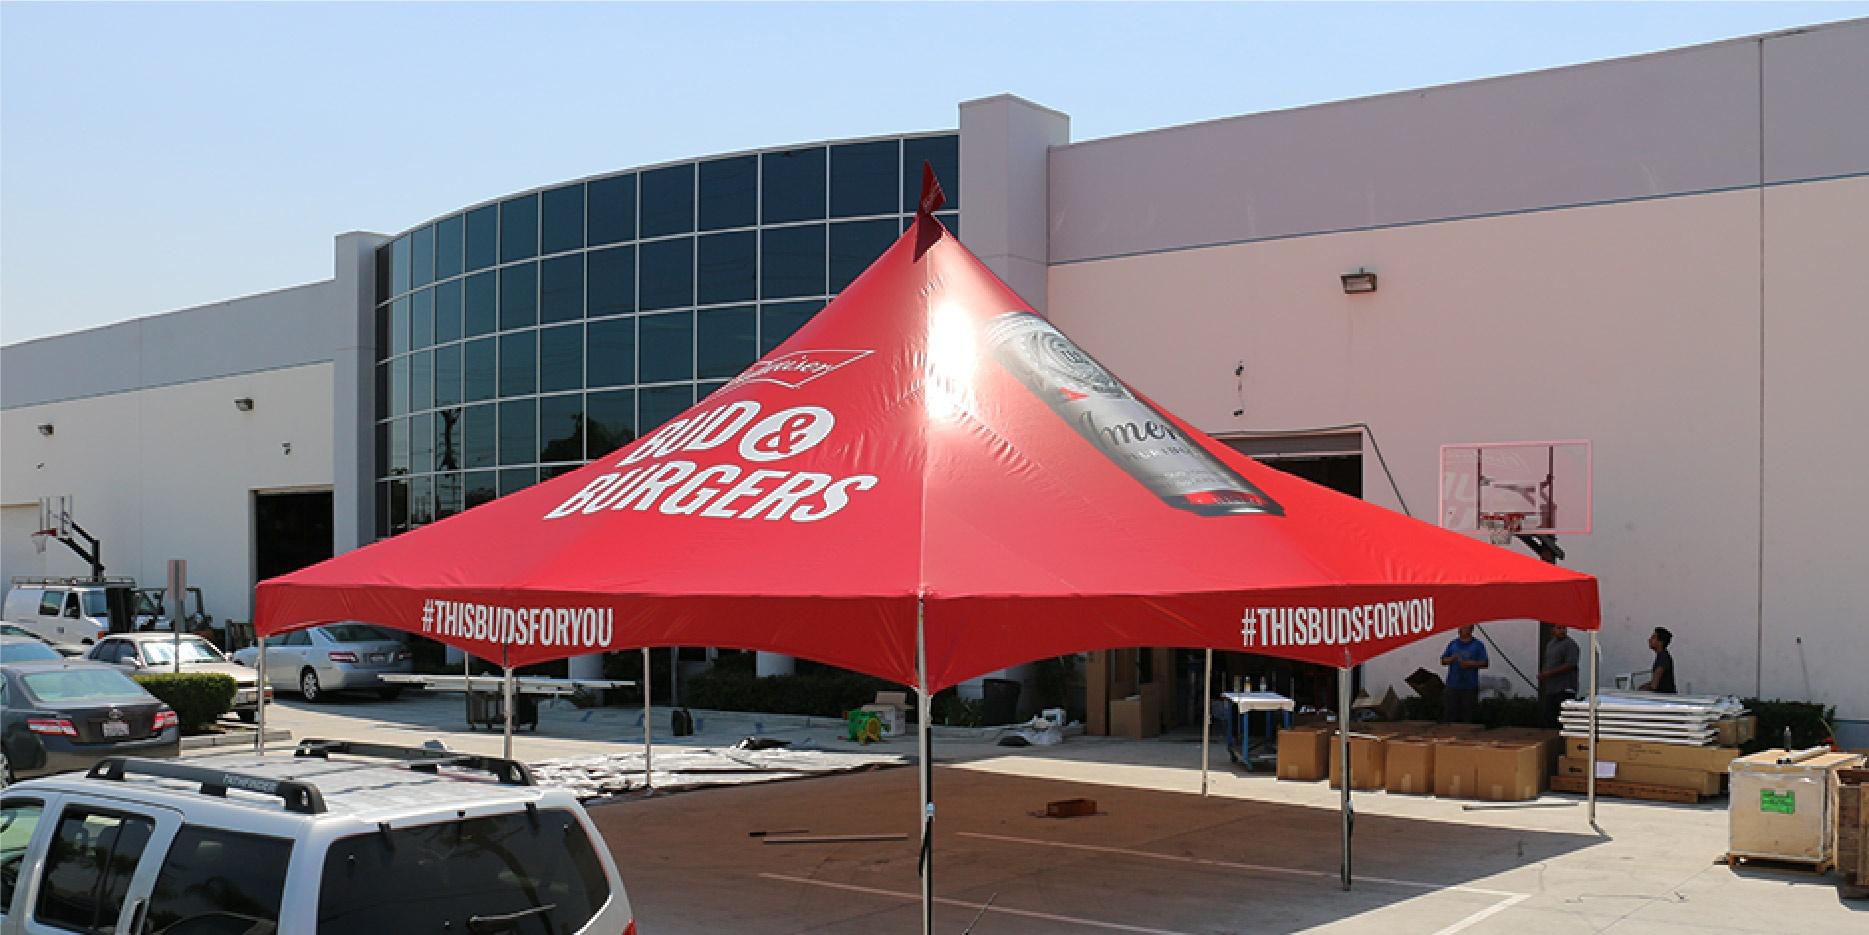 Budweiser 30x30 Red High Peak Tent